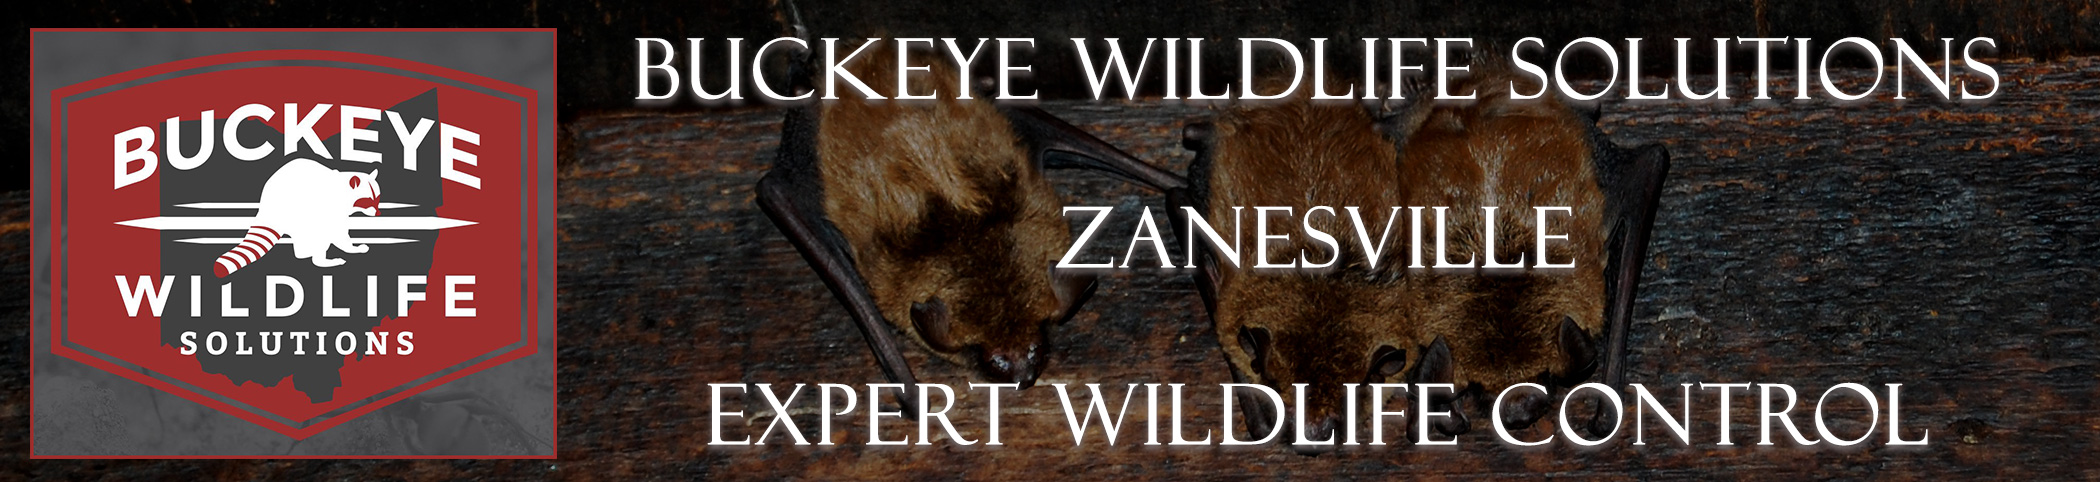 Zanesville-buckeye-wildlife-solutions-ohio-header-image